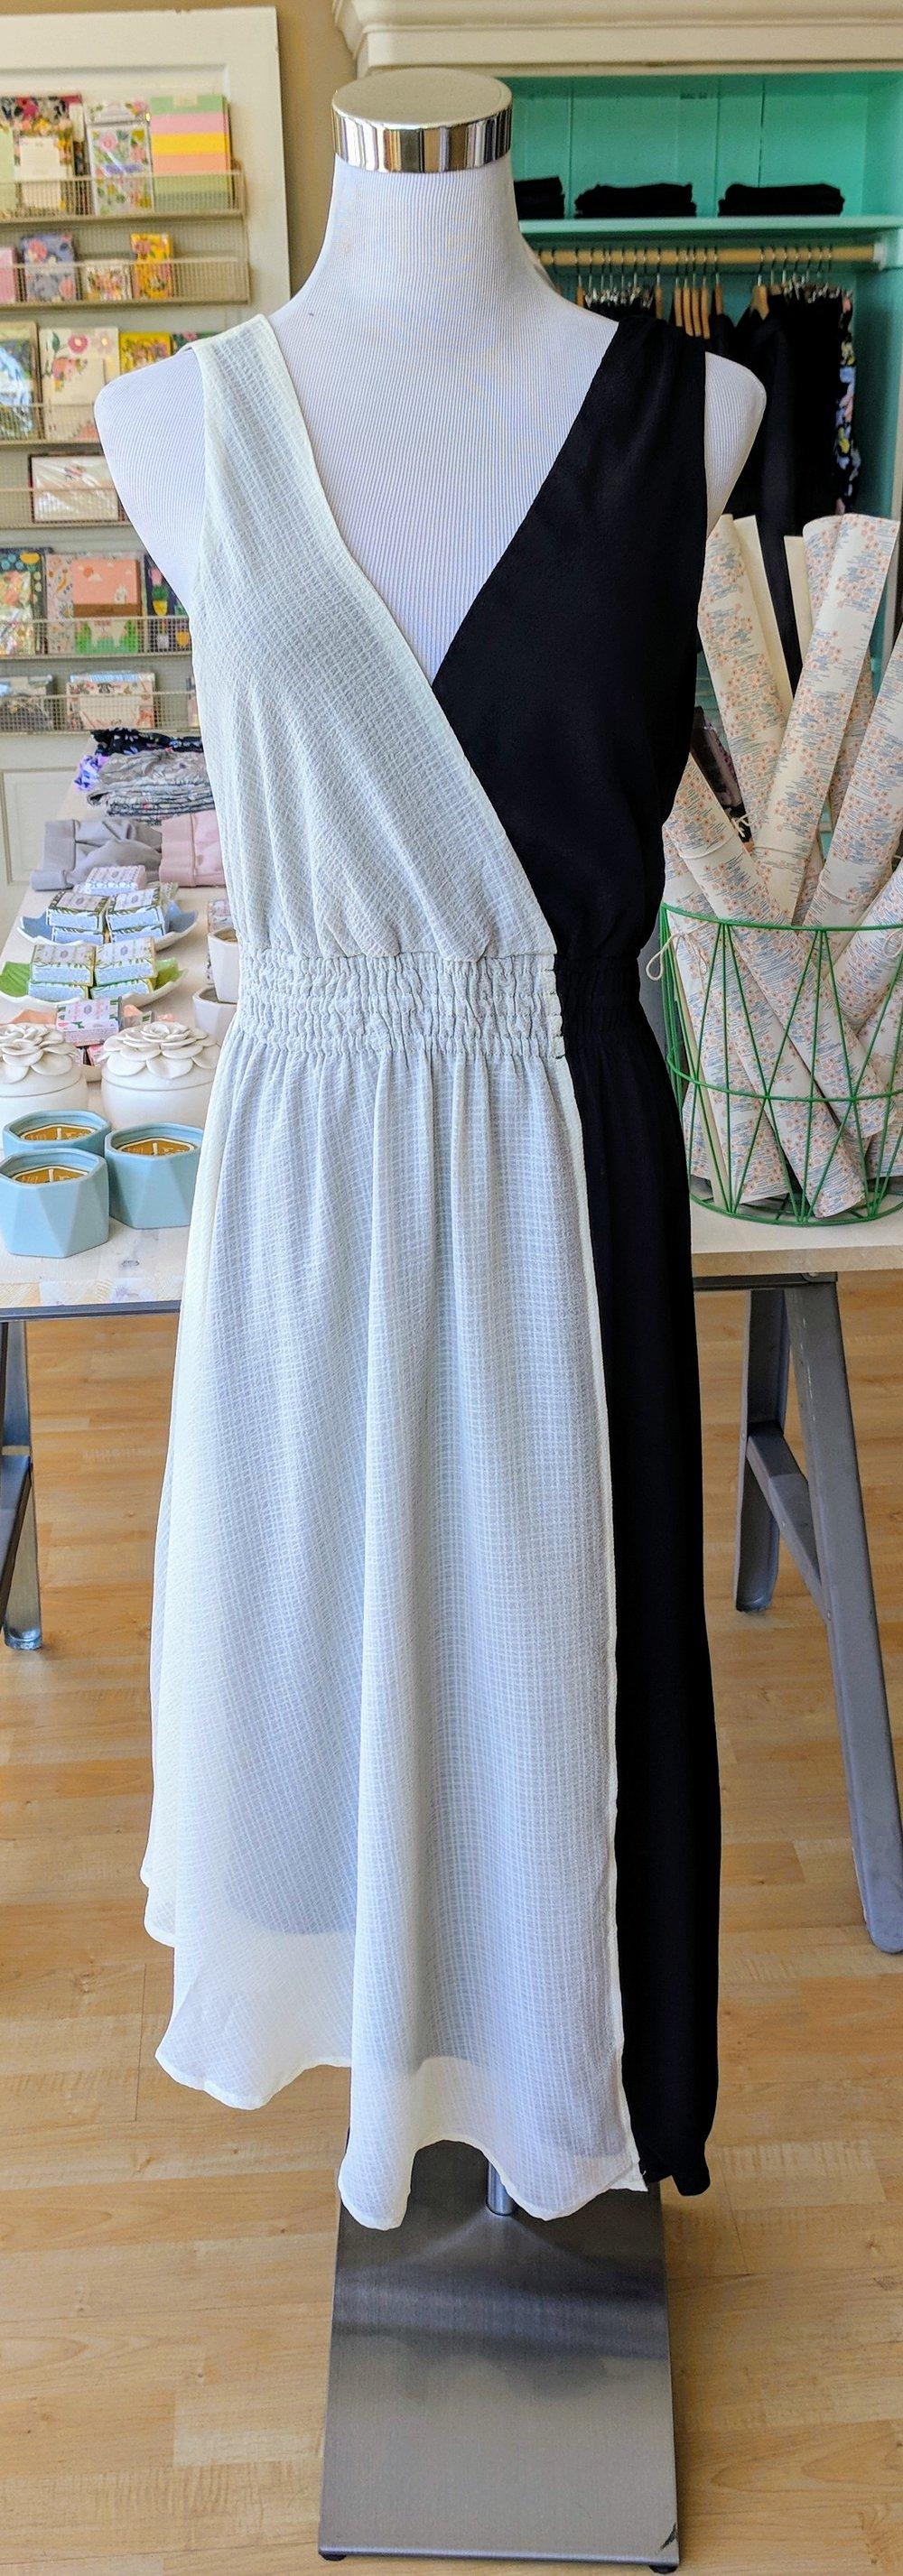 Black and Ivory A-line dress with v-neckline.